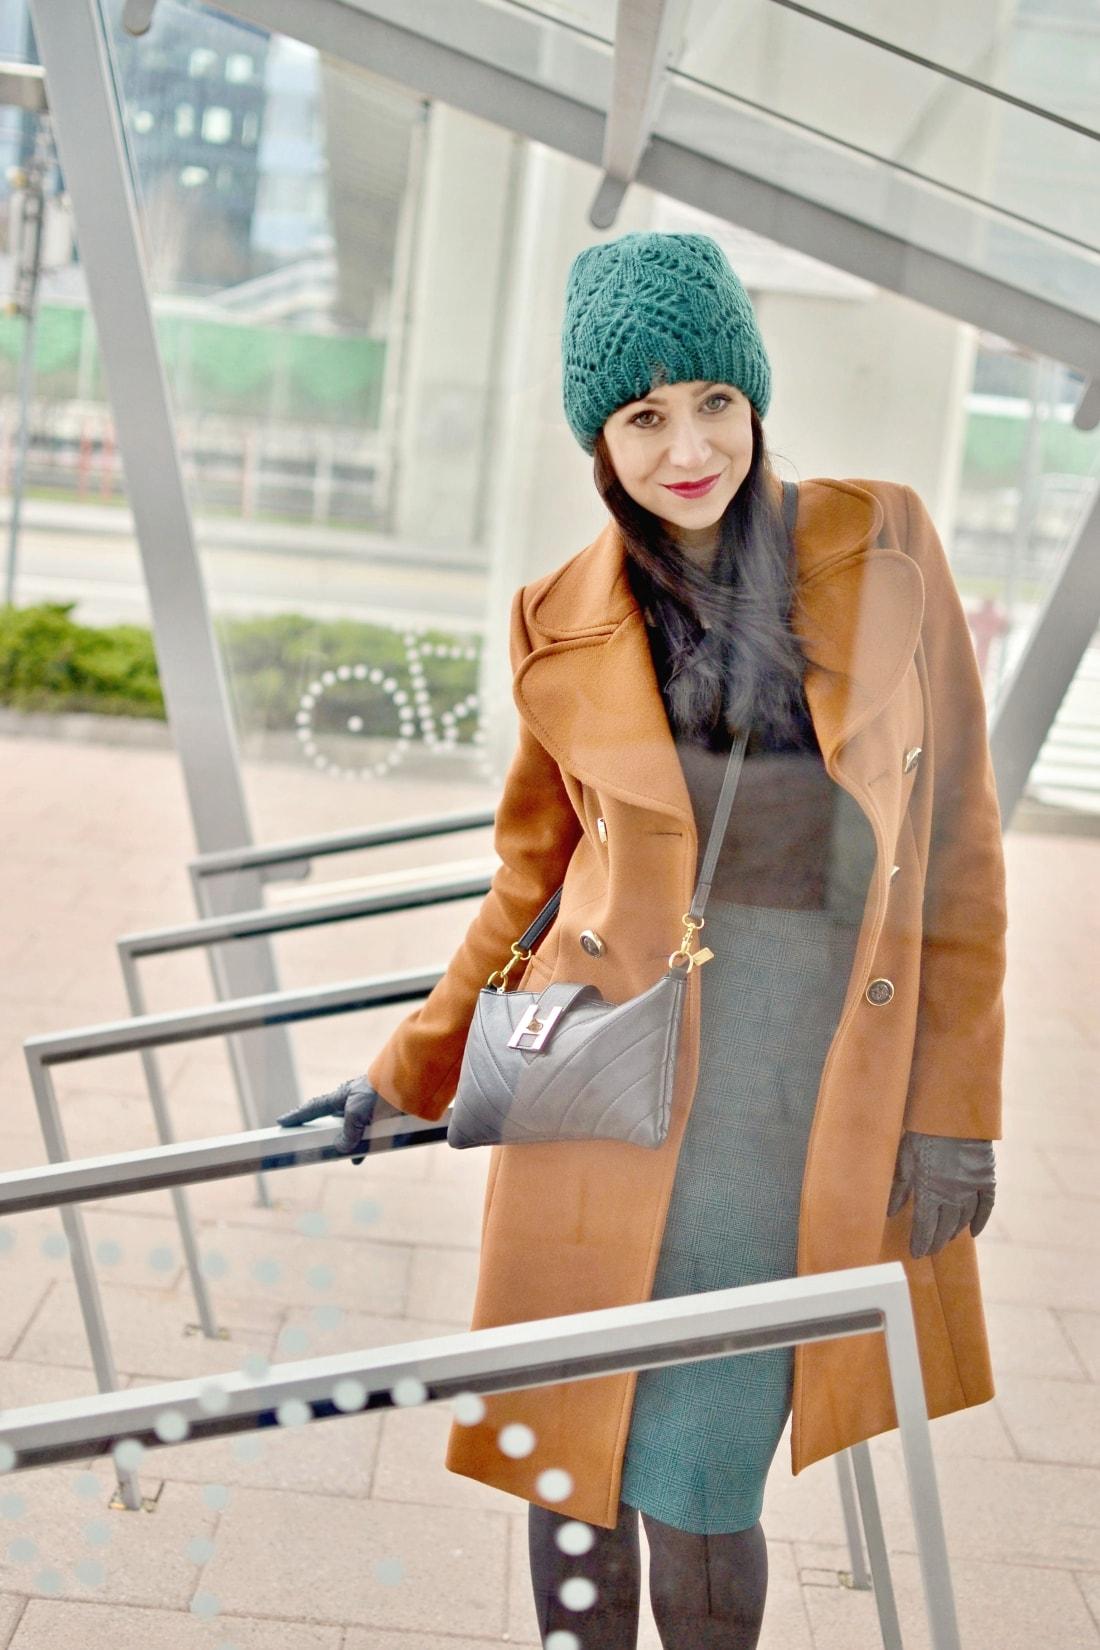 katharine-fashion-is-beautiful-blog-sukna-outfit-5